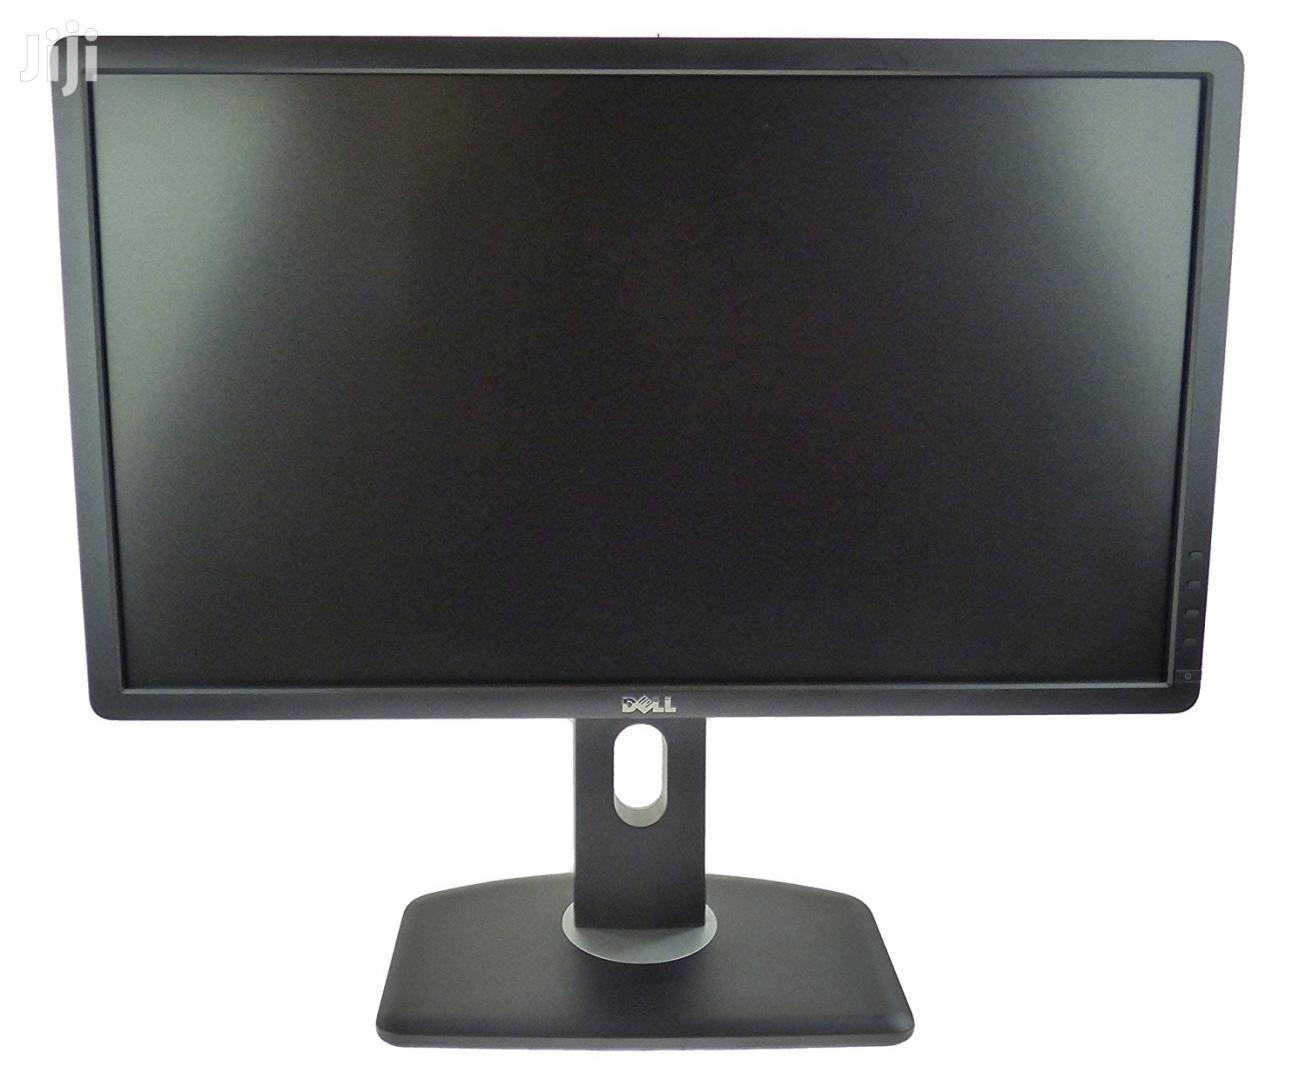 Dell Modern 20inch HD Widescreen Monitor